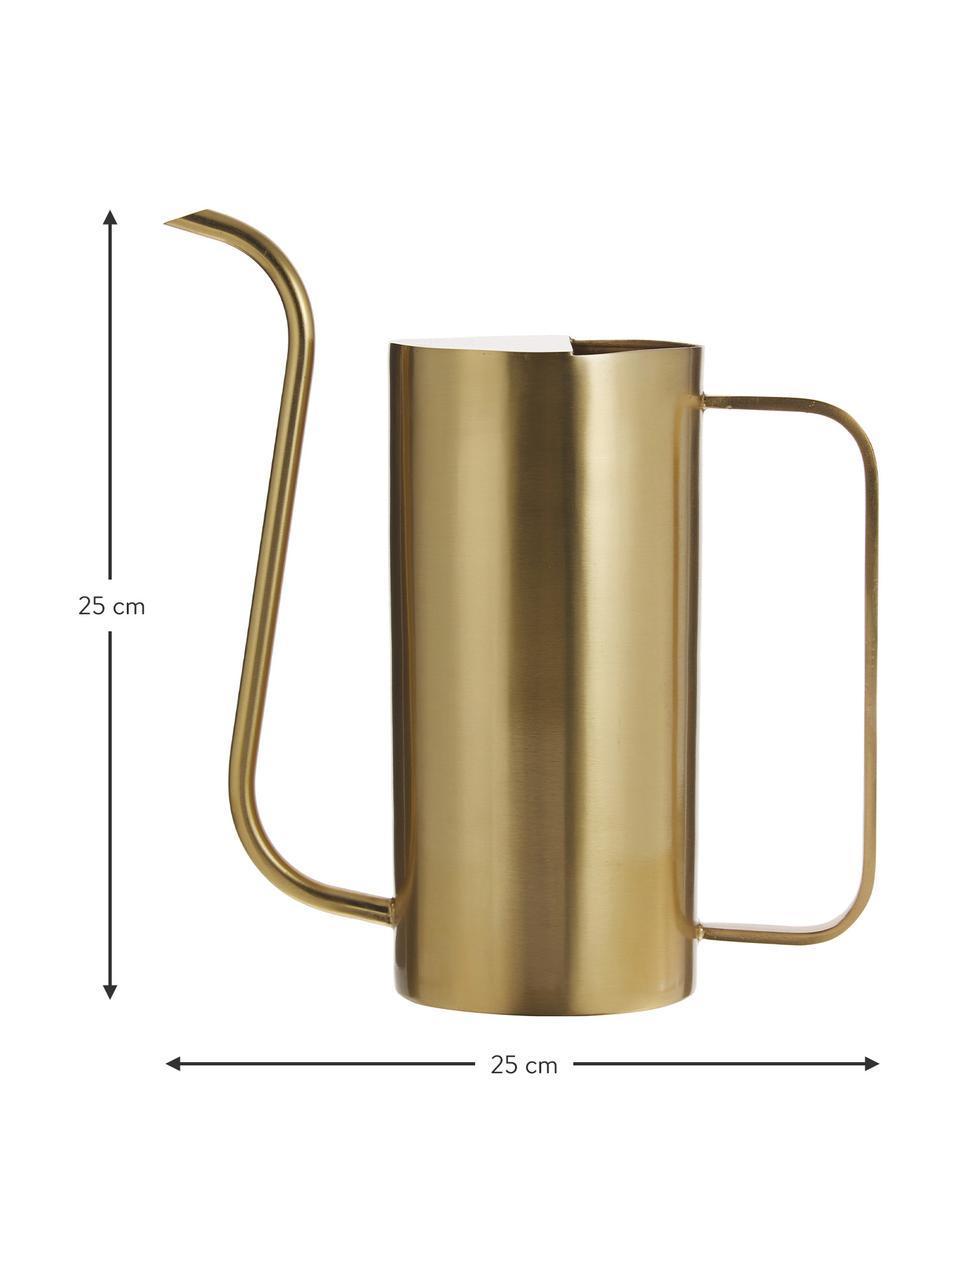 Arrosoir Brass, Laiton